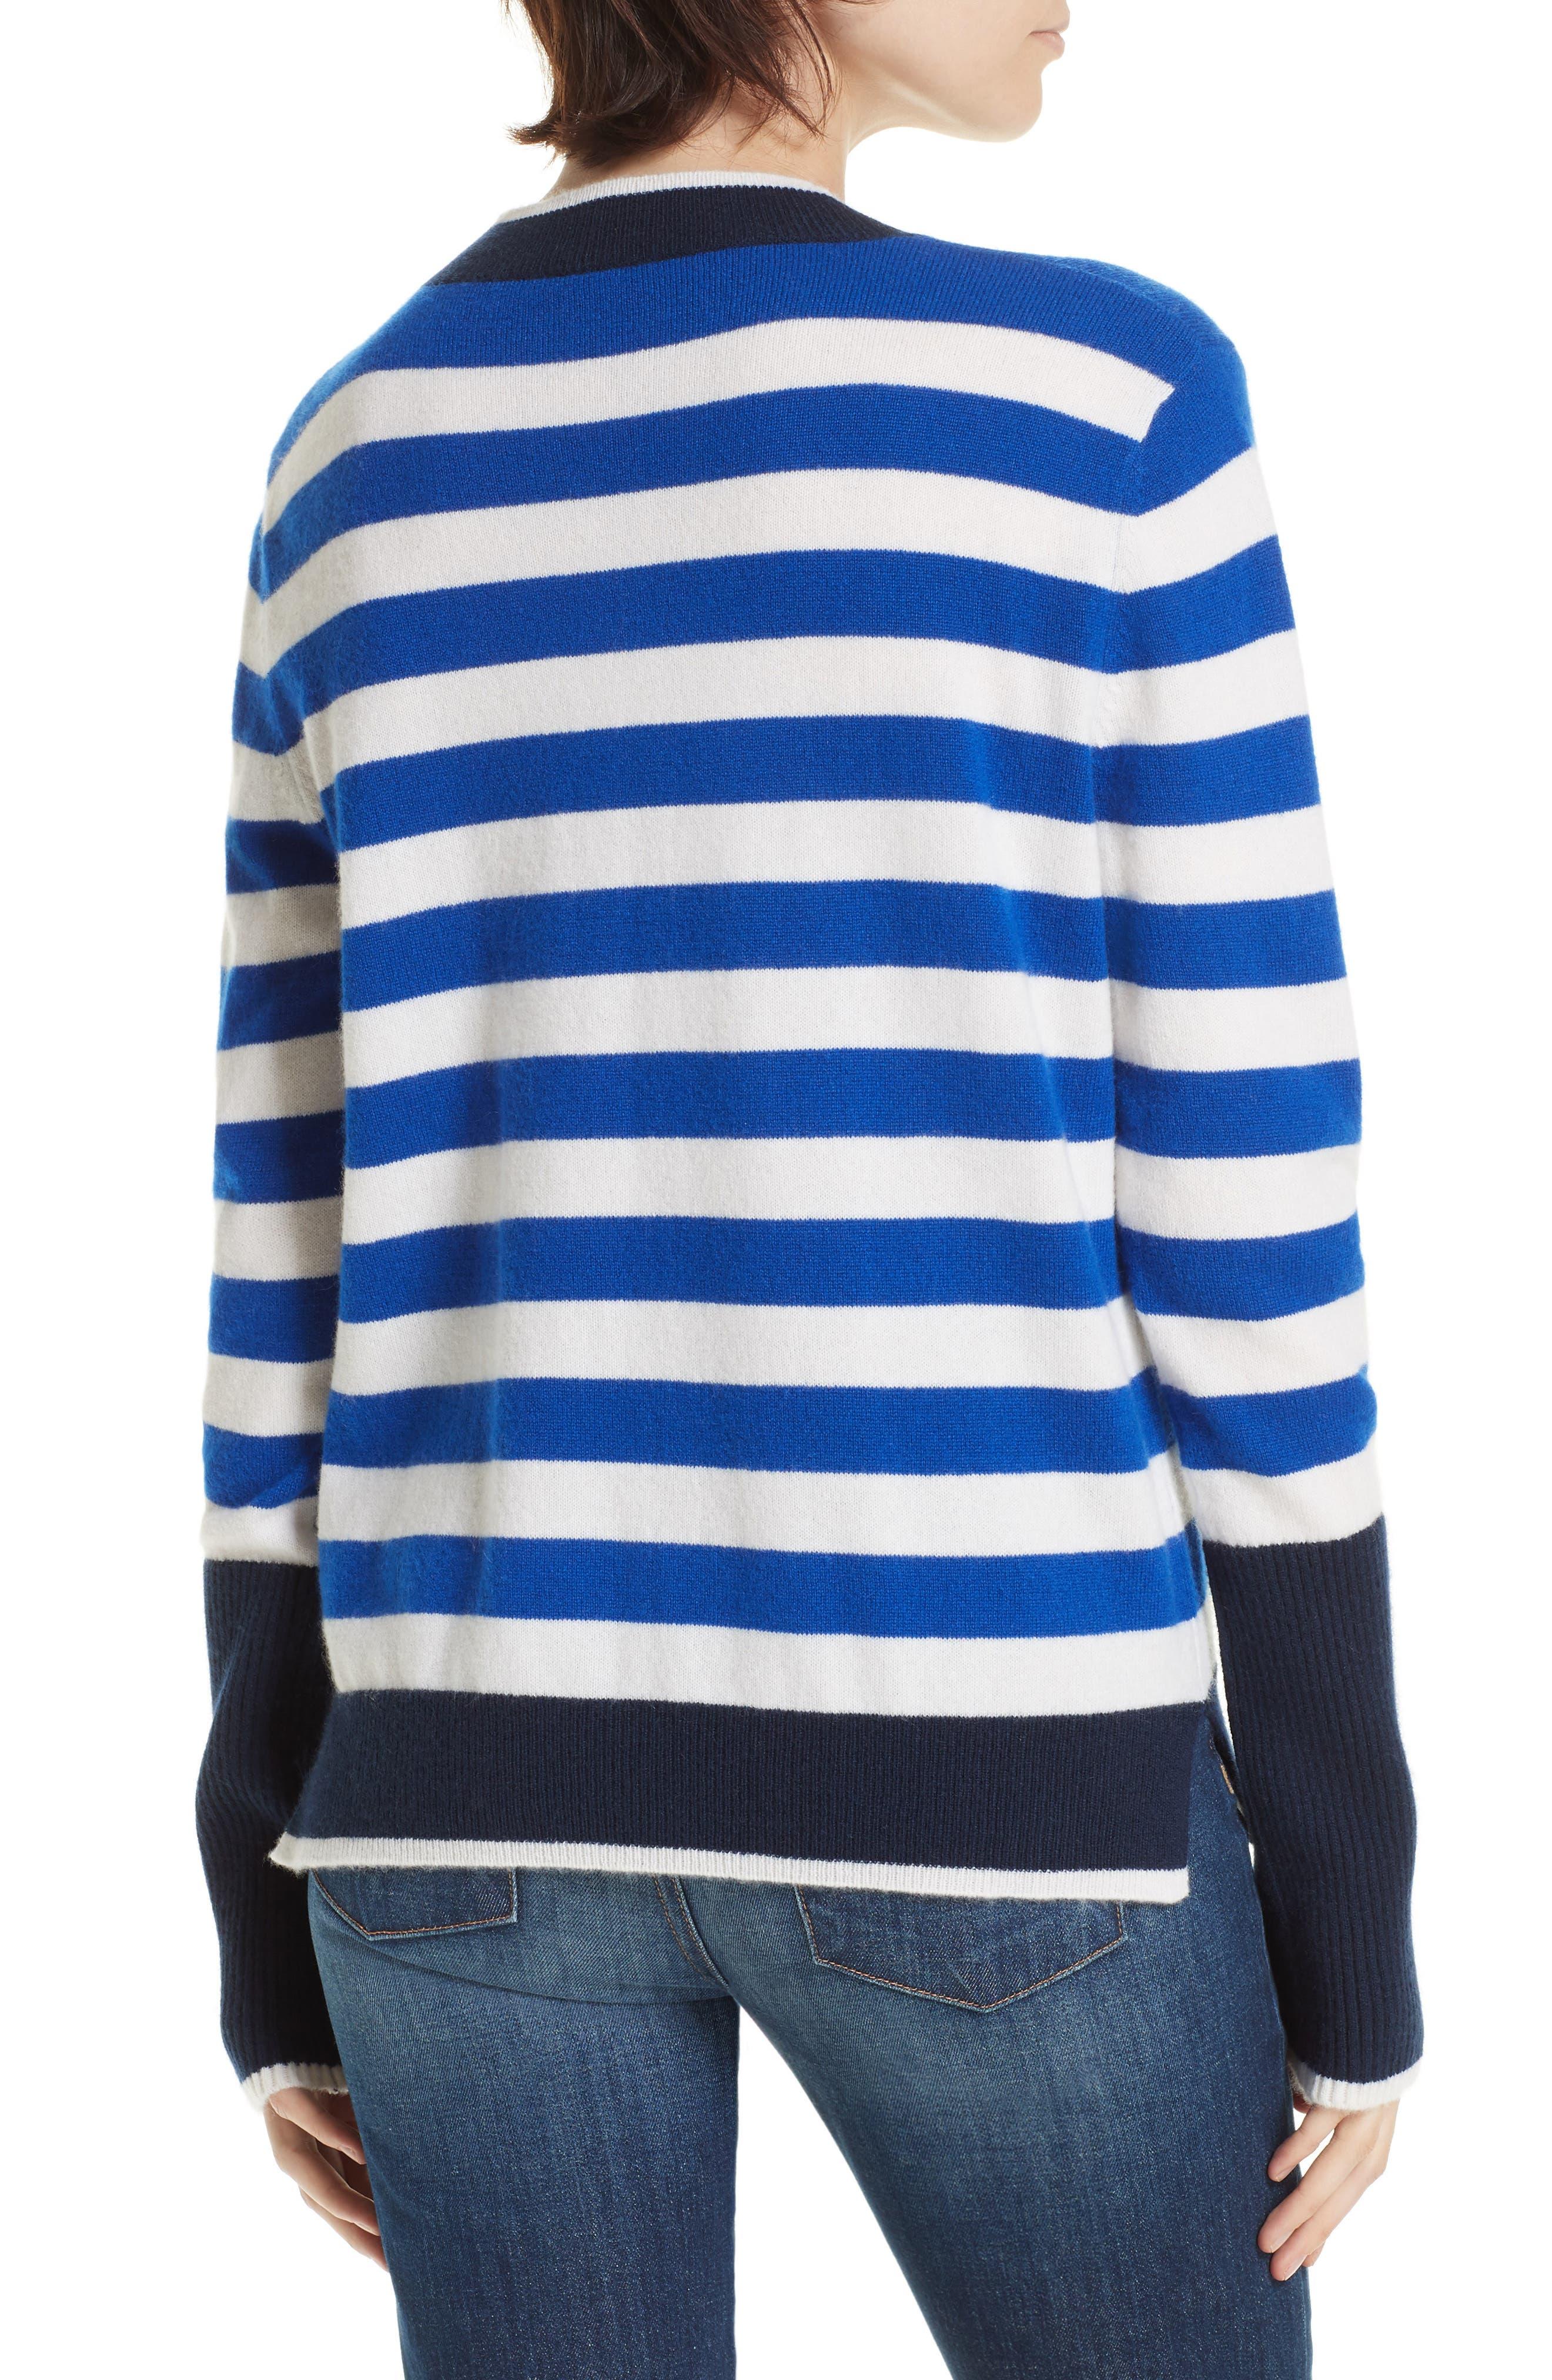 L'Universite Cashmere Sweater,                             Alternate thumbnail 2, color,                             BRIGHT BLUE/ CREAM/ NAVY